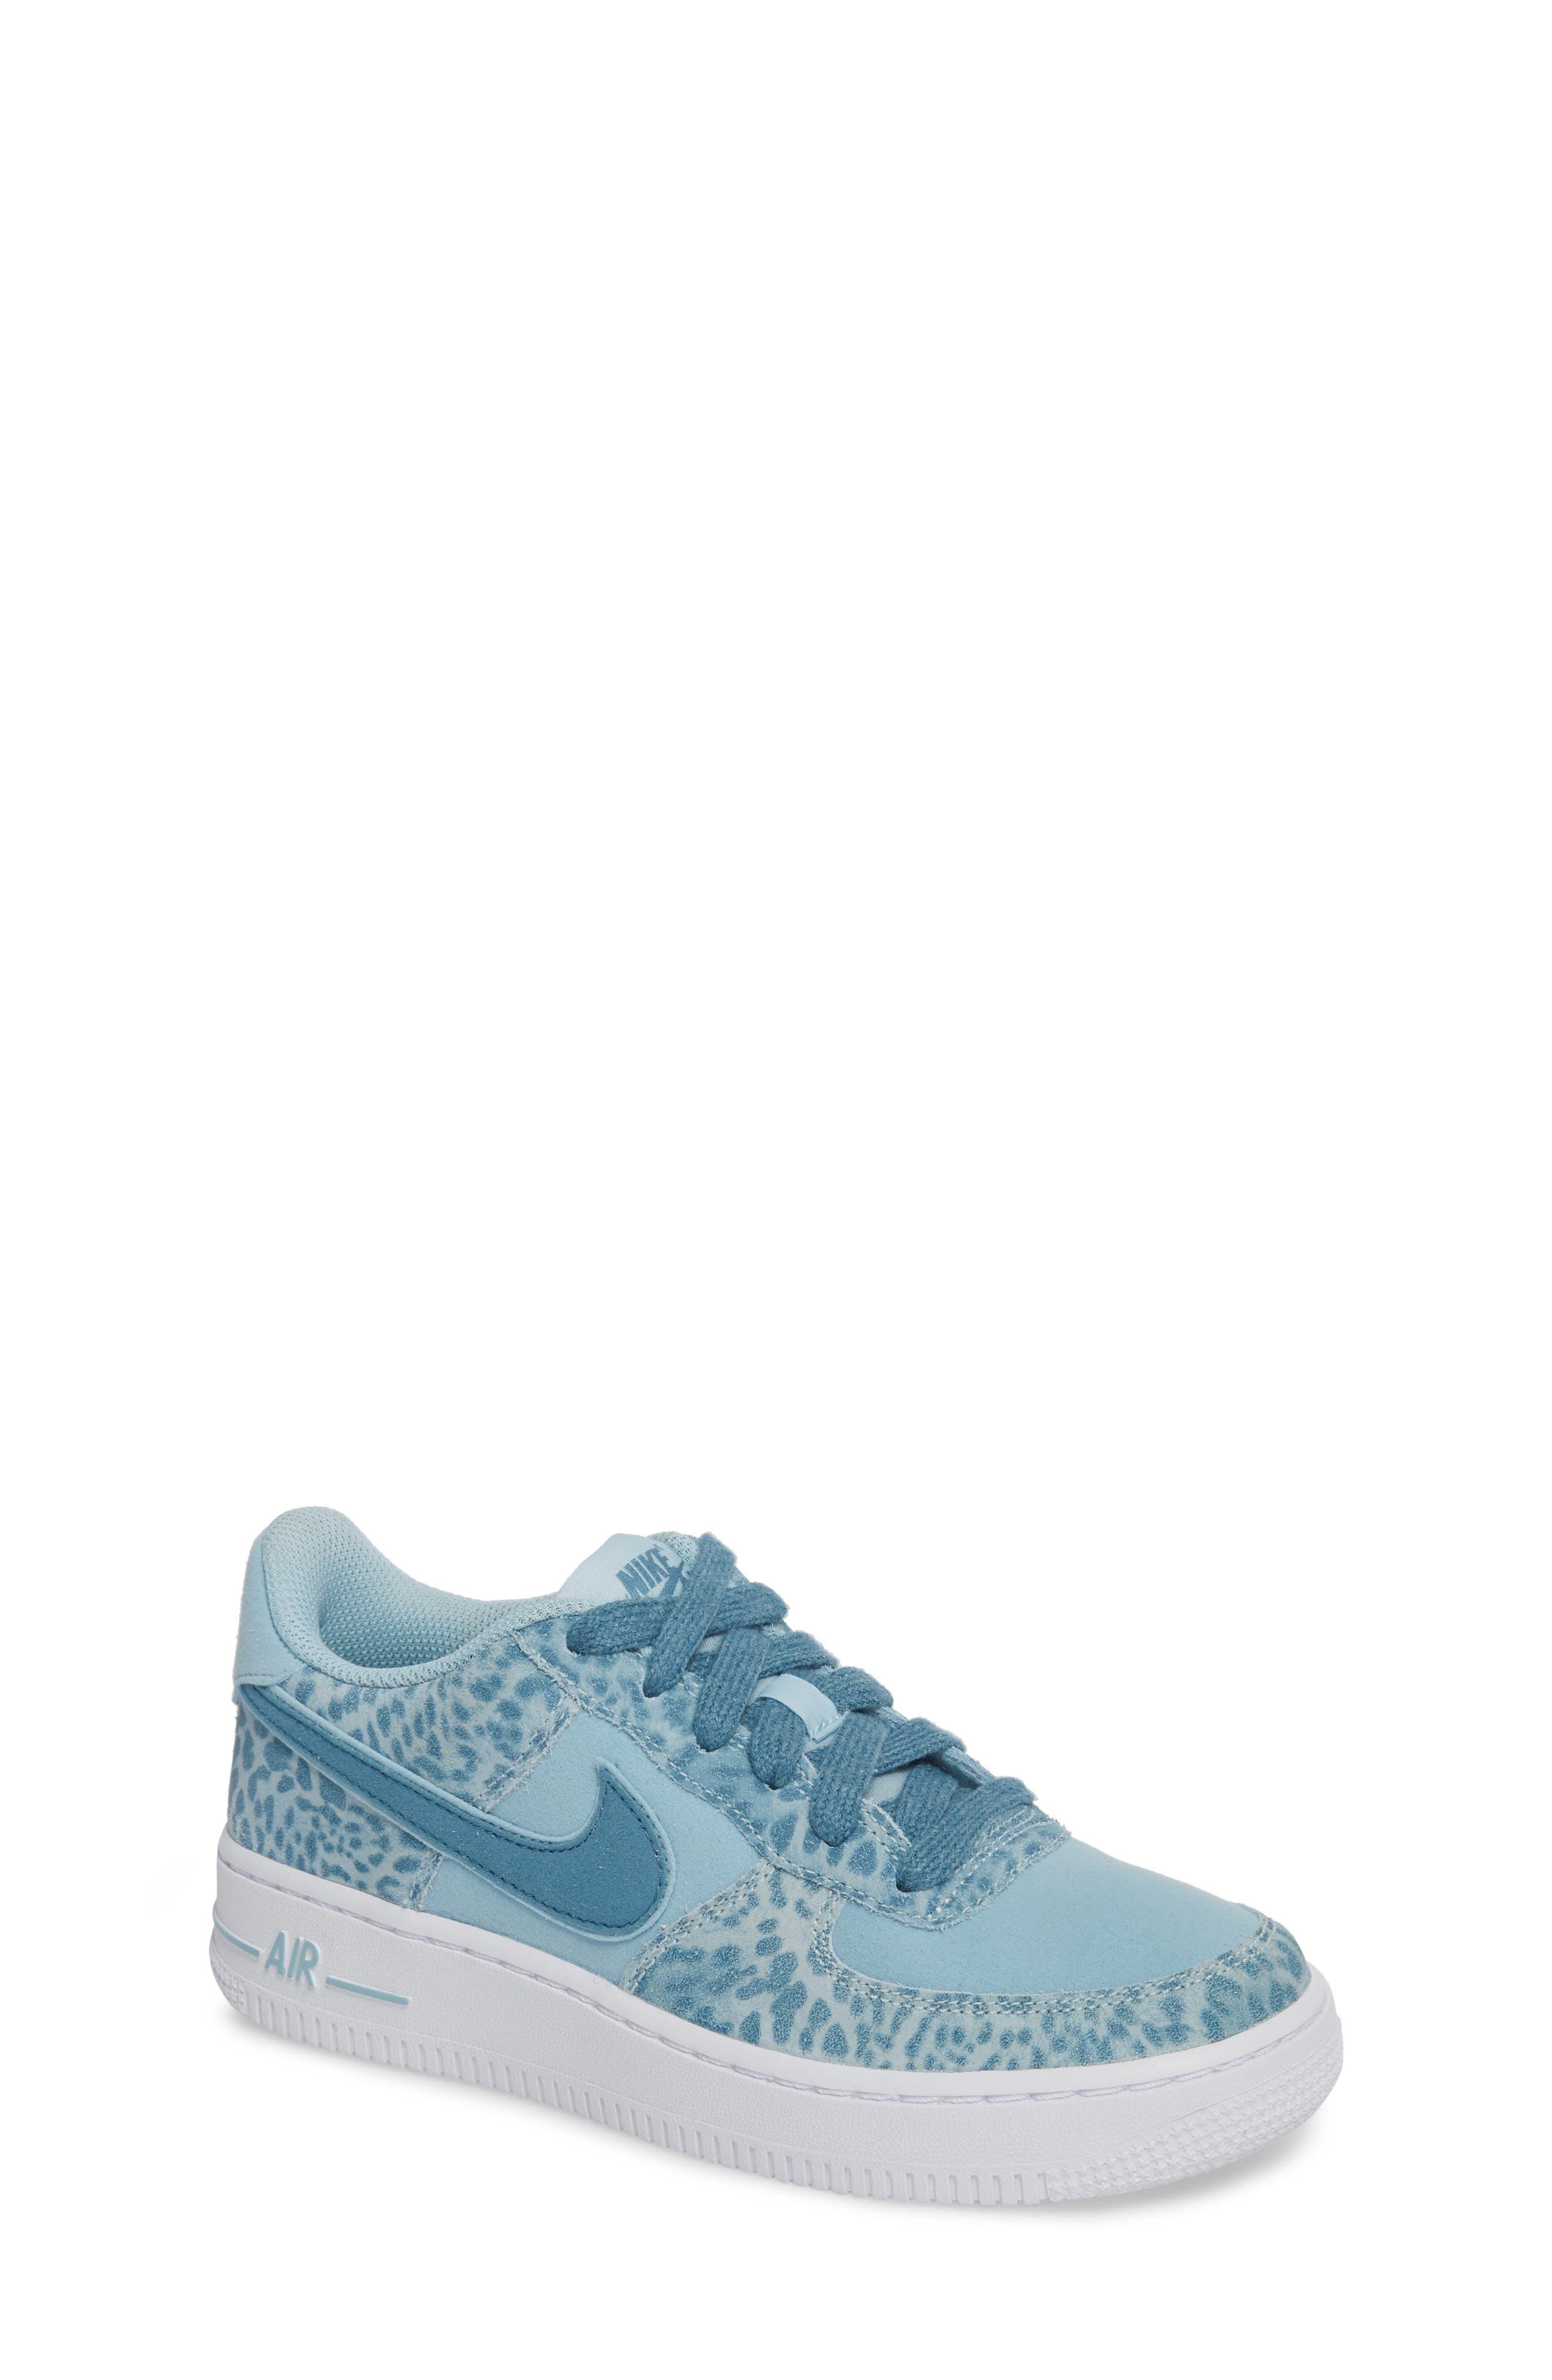 Air Force 1 LV8 Sneaker,                             Main thumbnail 2, color,